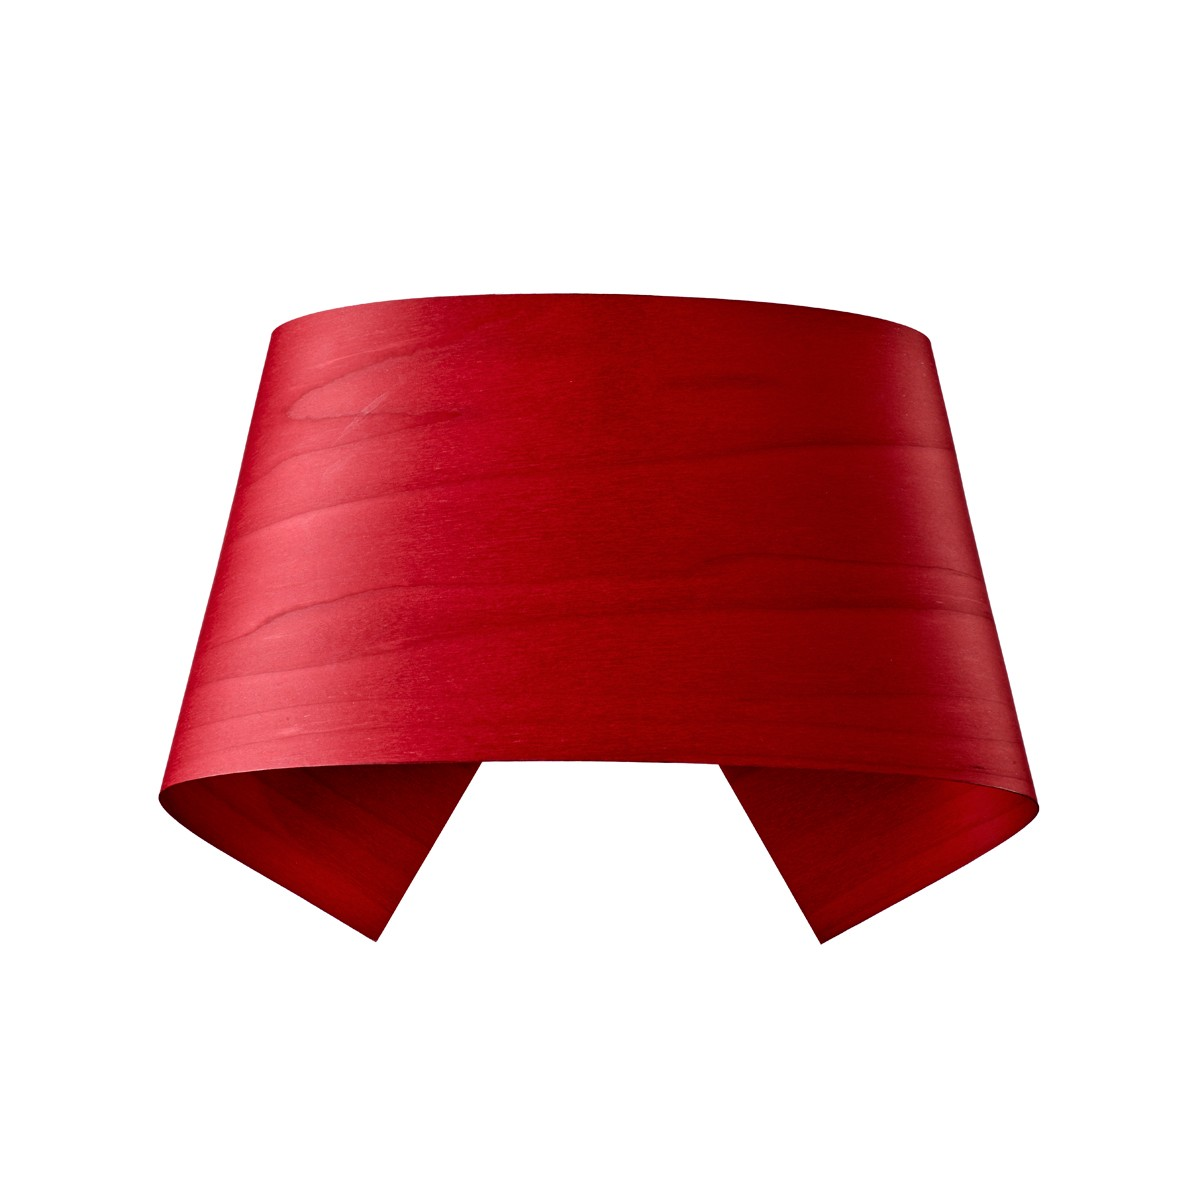 LZF Lamps Hi-Collar Wandleuchte, rot